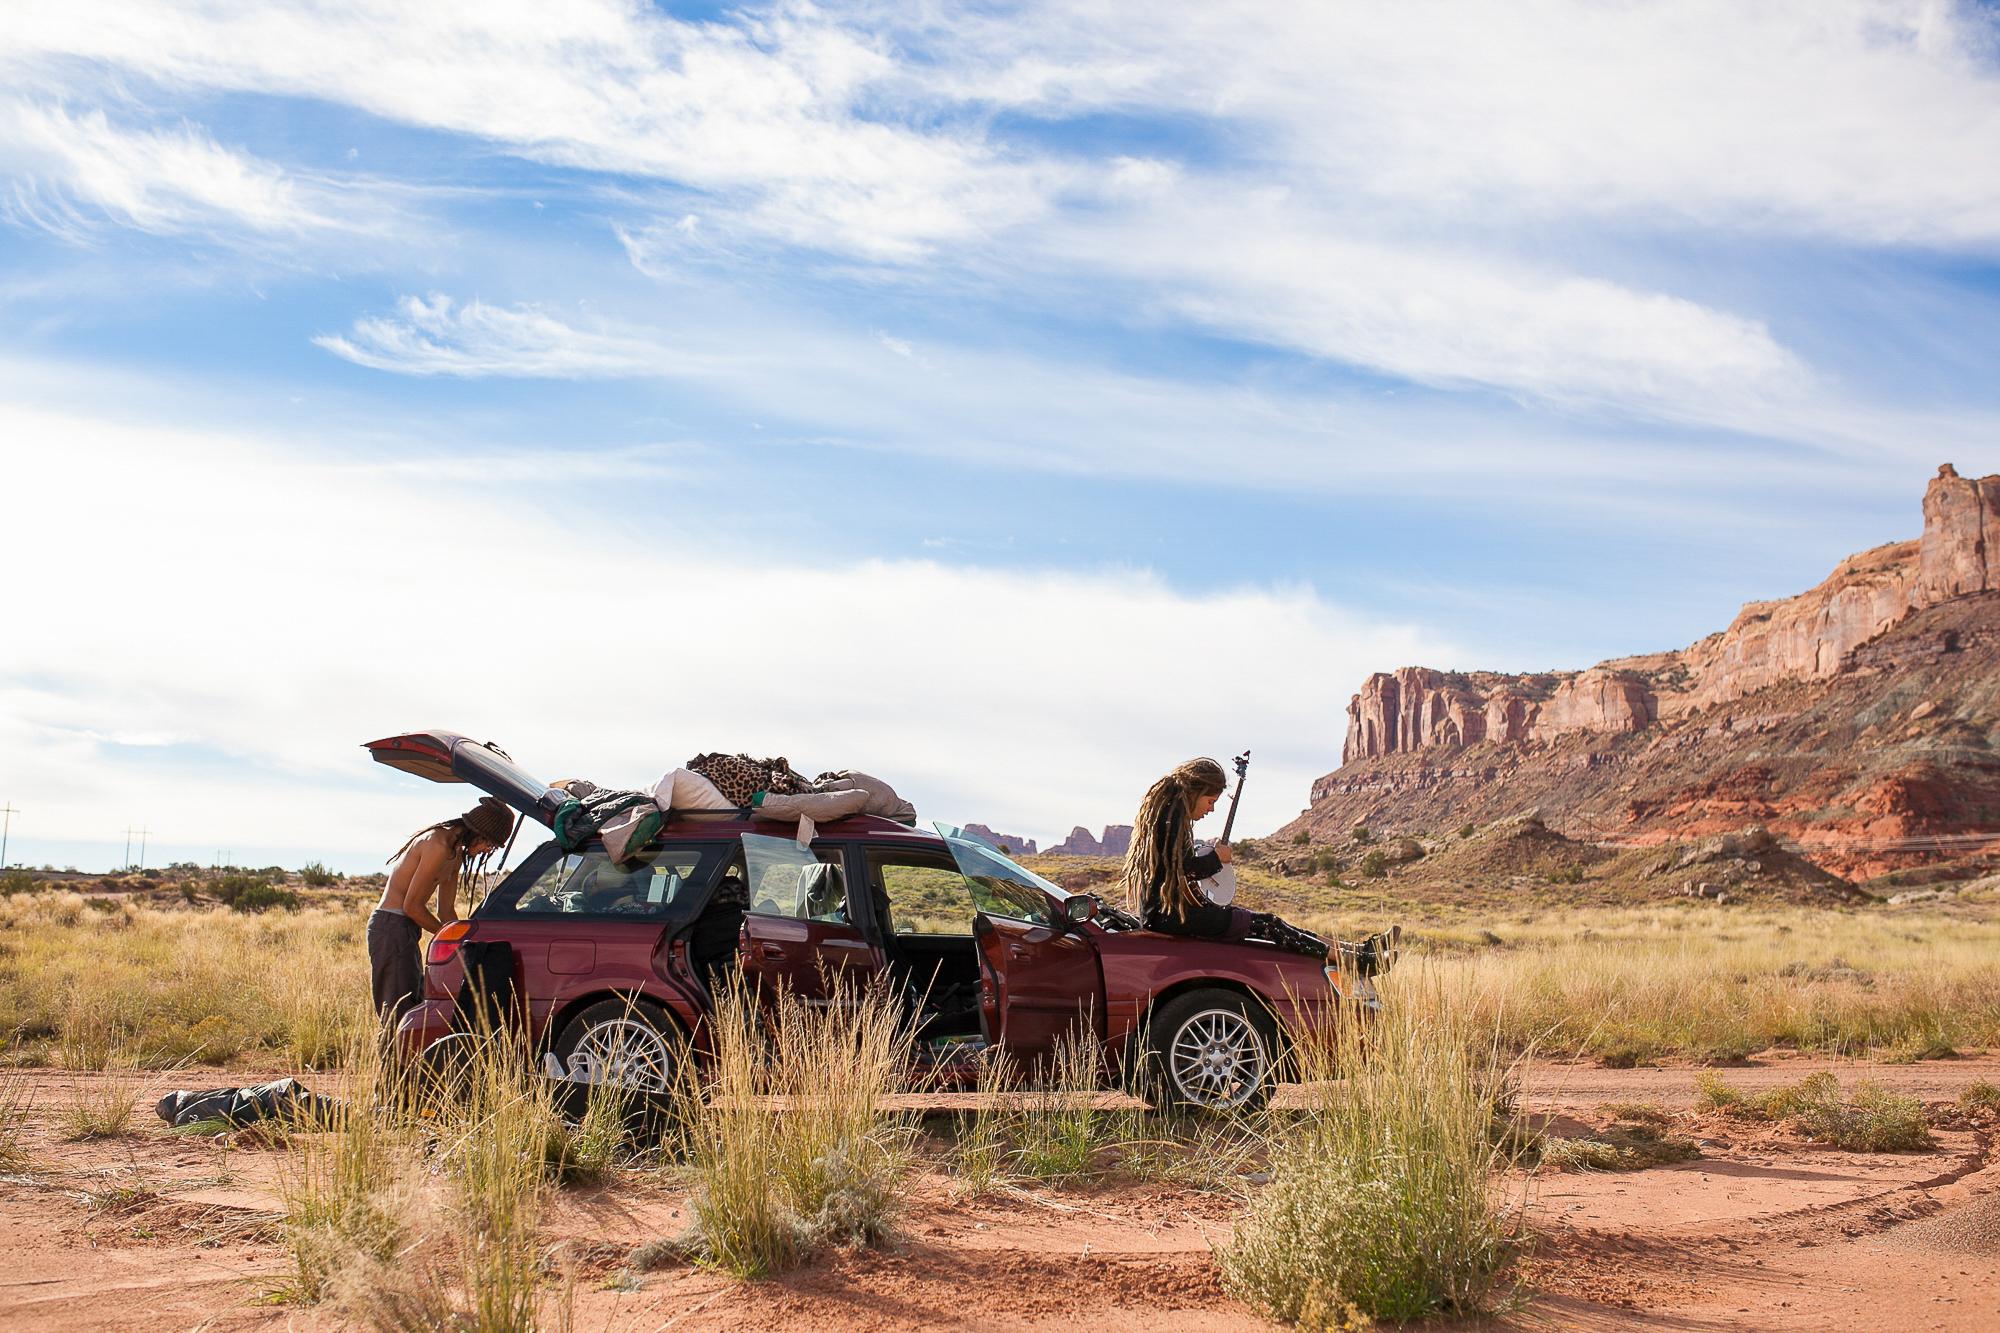 064Travel_Adventure_Outdoor_Photography_Outlive_Creative_Utah_Dessert_Road_Trip.jpg